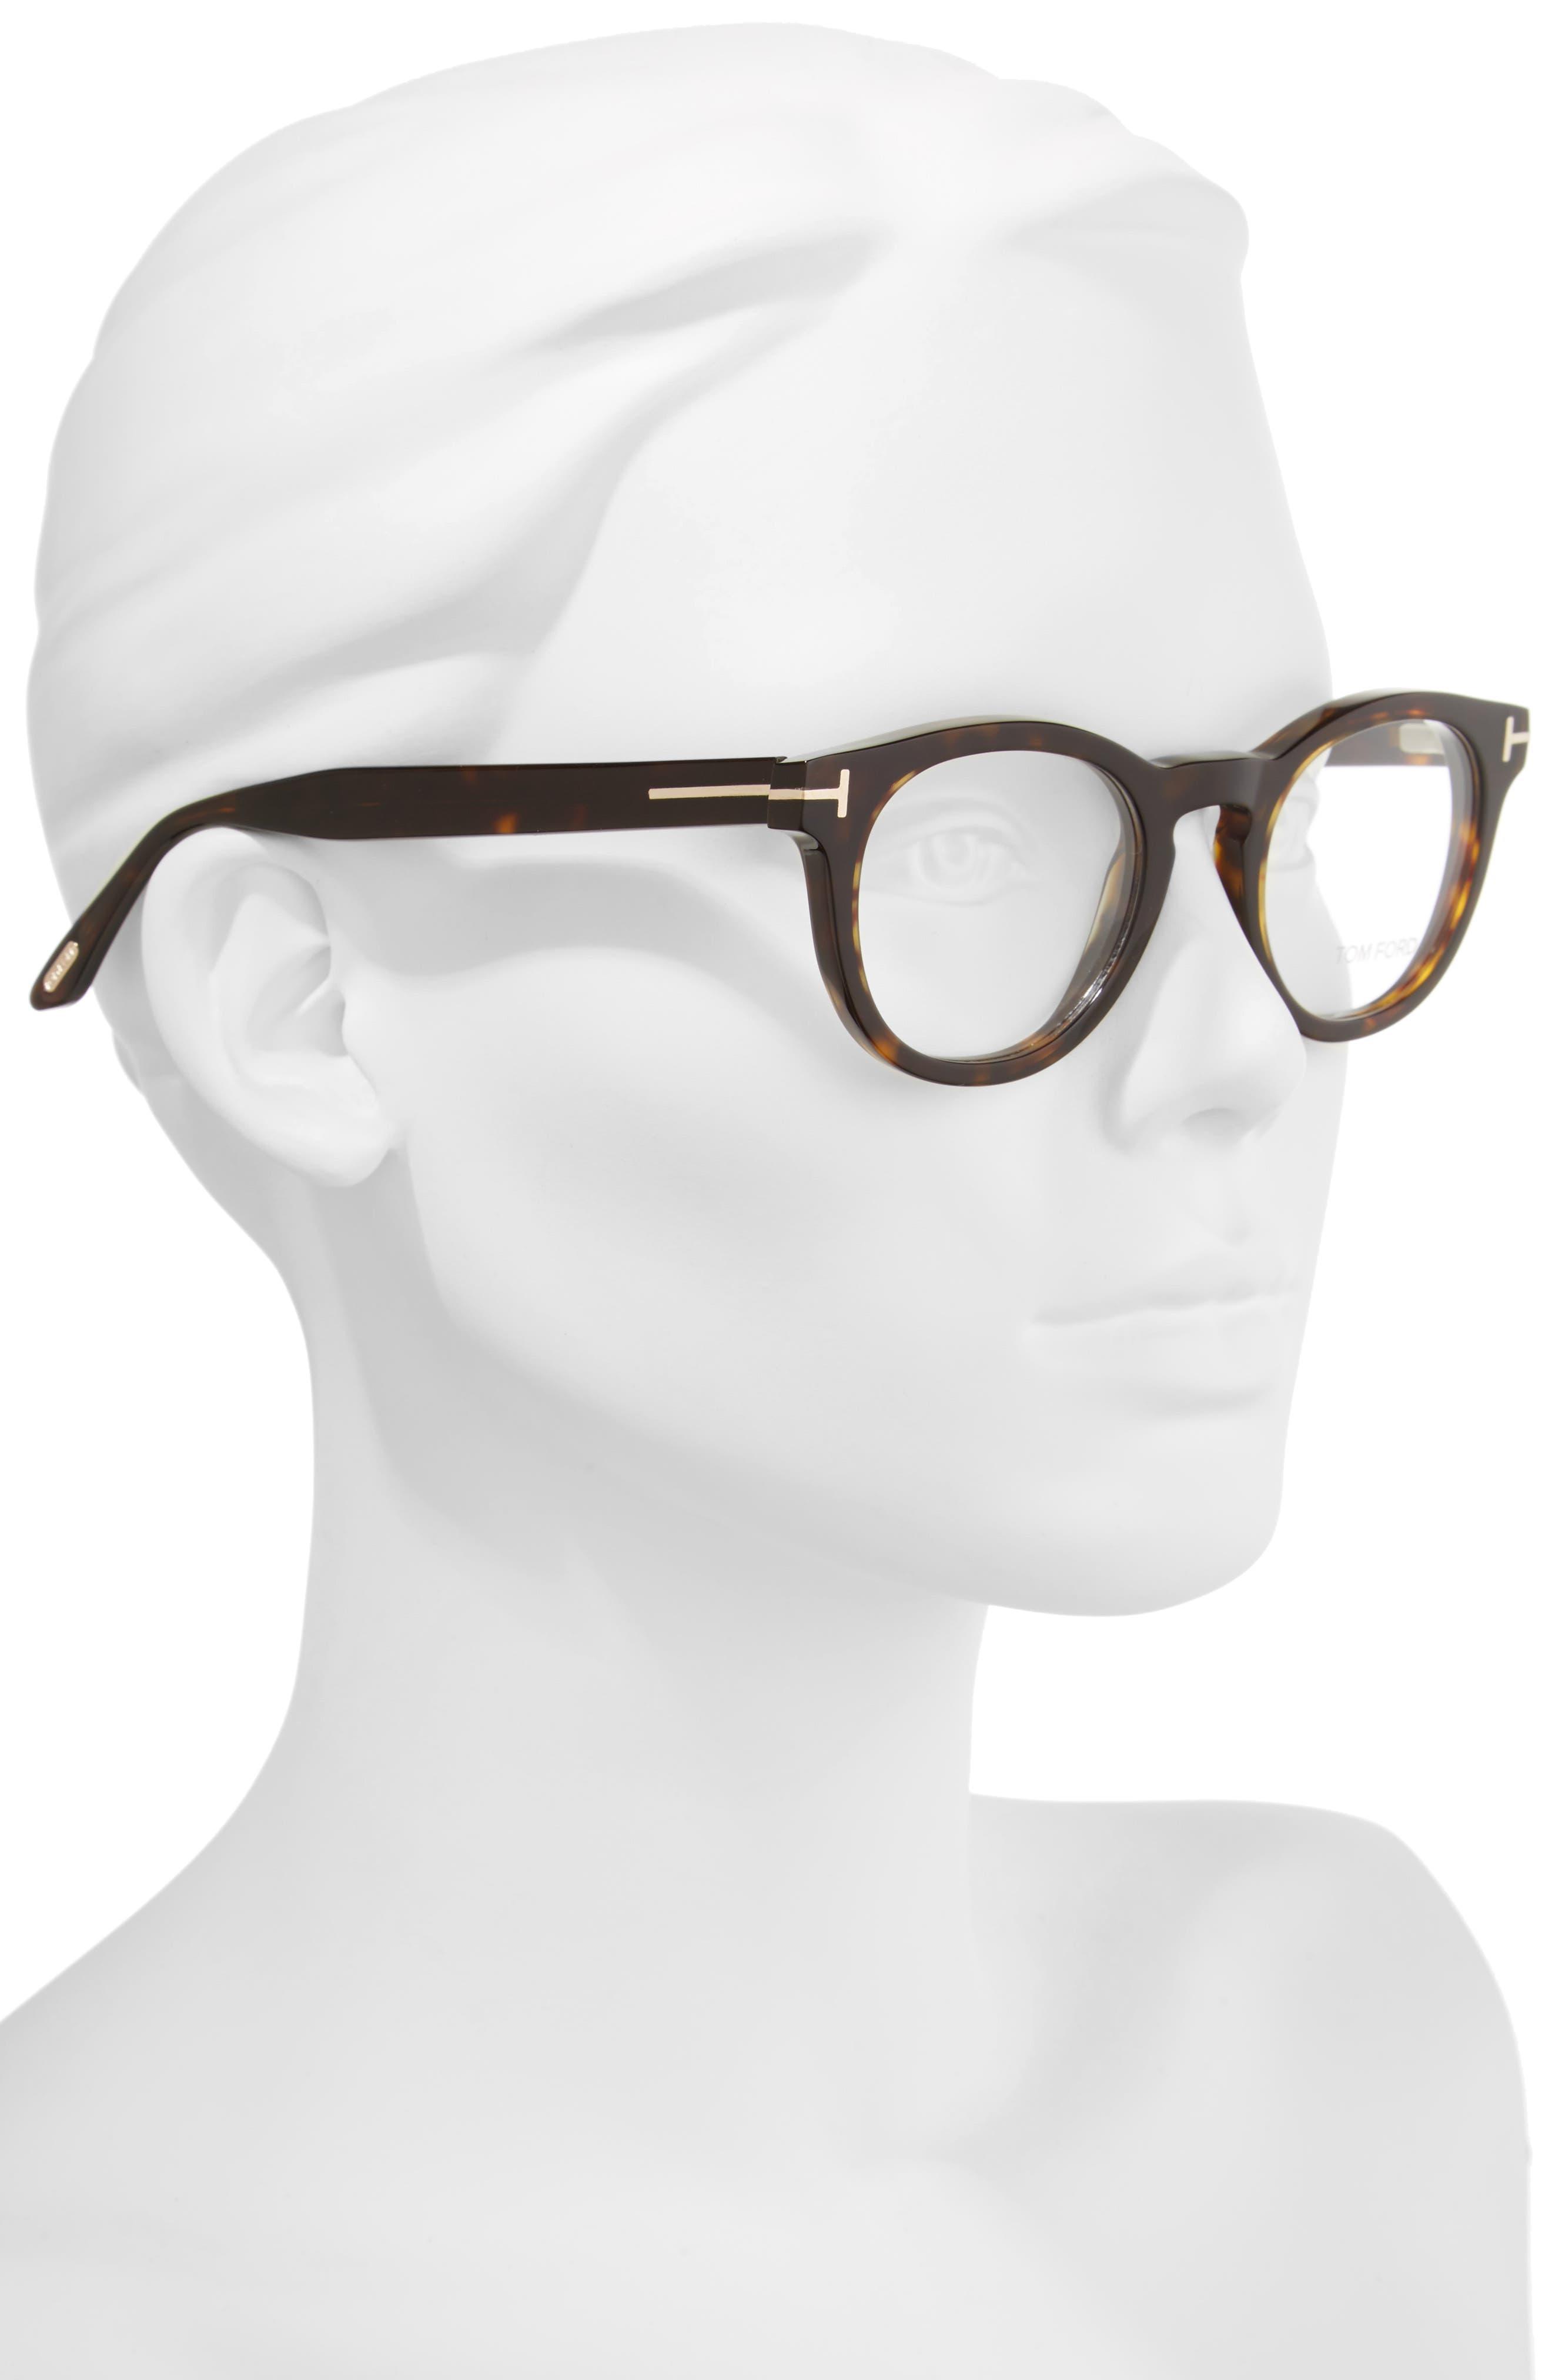 48mm Round Optical Glasses,                             Alternate thumbnail 5, color,